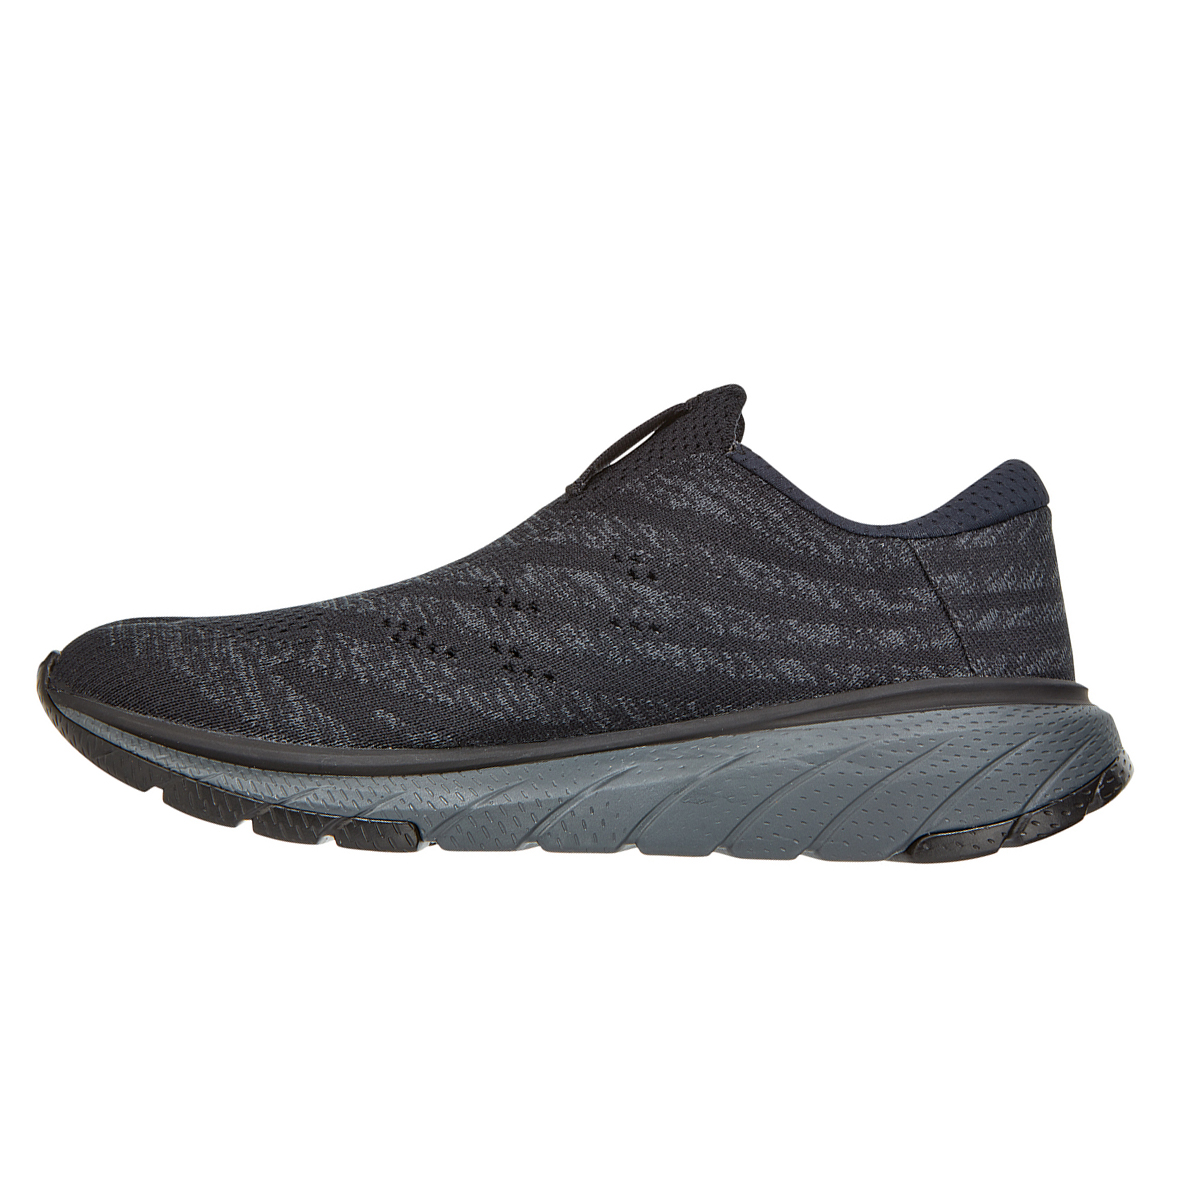 Women's Hoka One One Cavu 3 Slip Running Shoe - Color: Black/Dark Shadow - Size: 5 - Width: Regular, Black/Dark Shadow, large, image 2